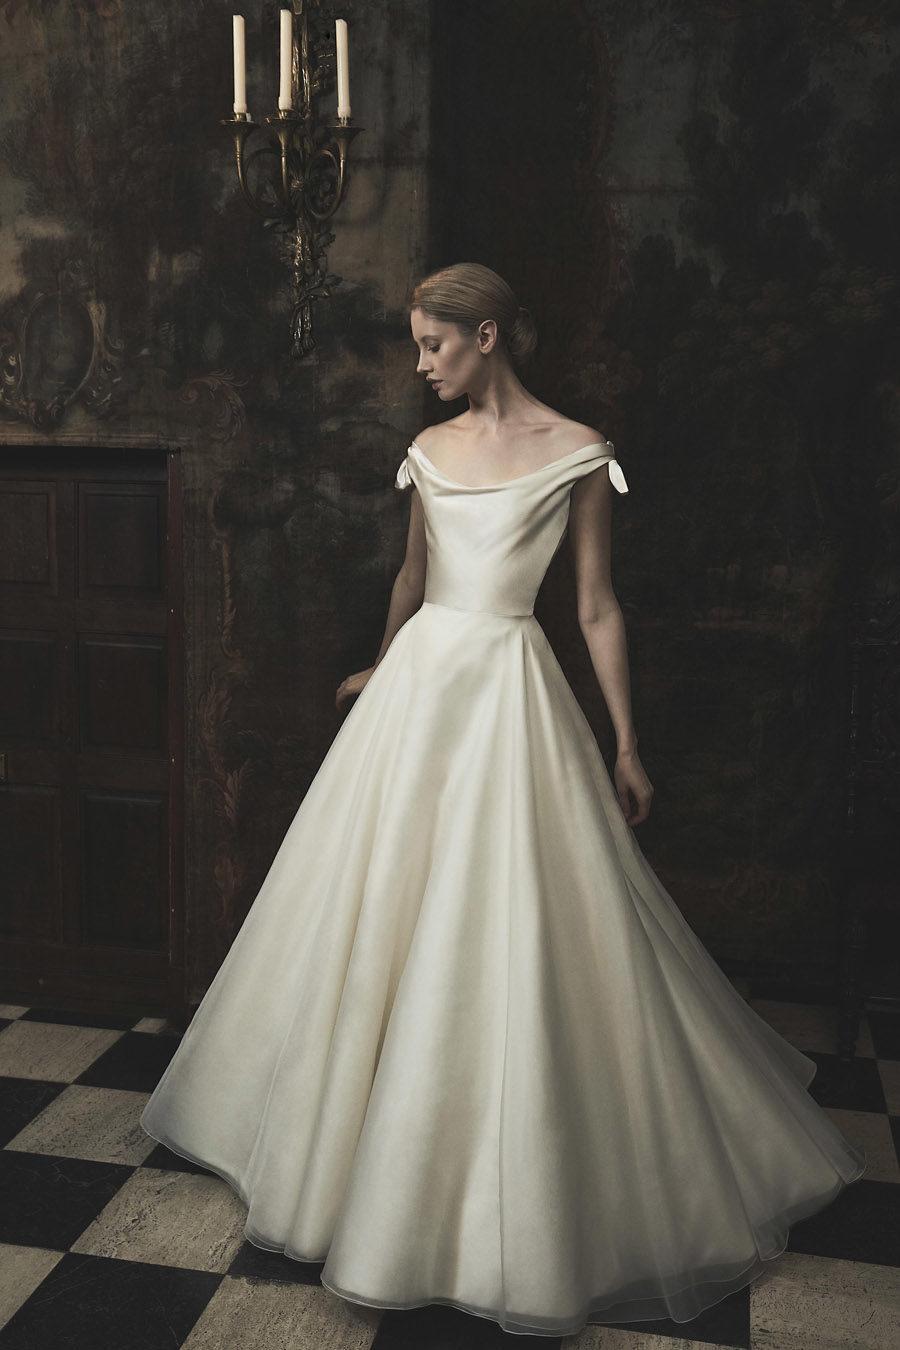 Wedding gowns UK 2019 Phillipa Lepley on English Wedding Blog (36)